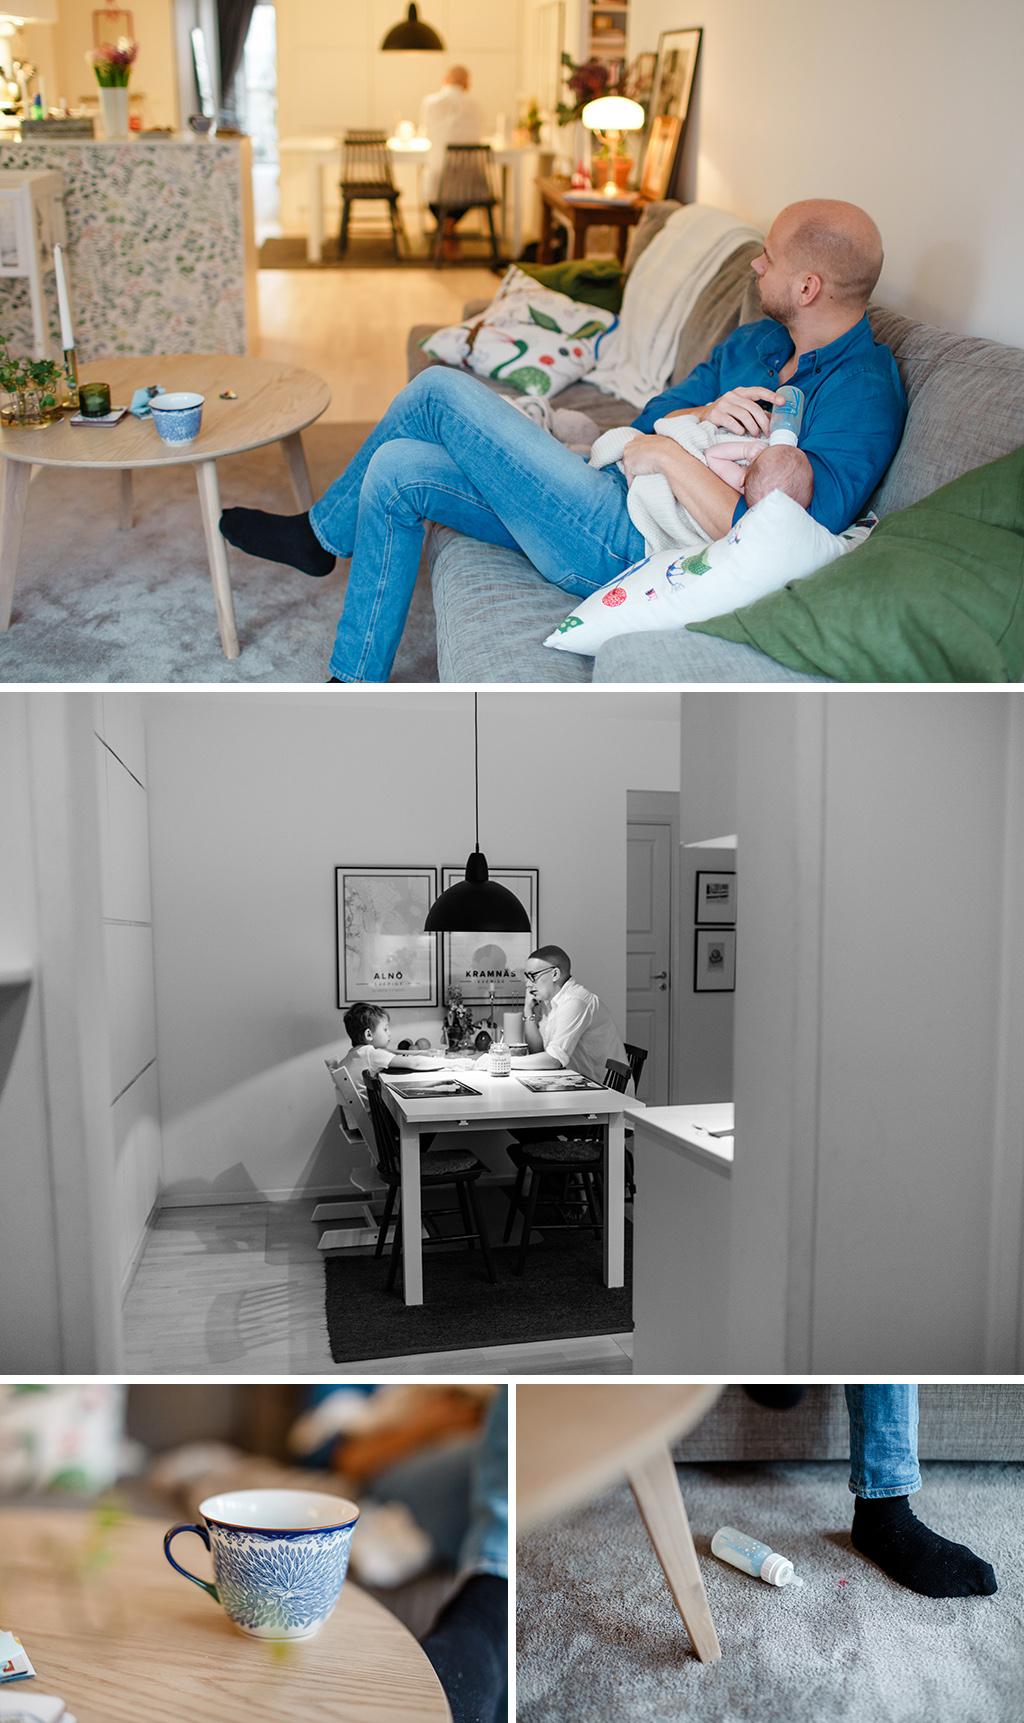 Lifestyle-nyfoddfotografering_newbornphotography_familjefotograf_Stockholm_11.jpg